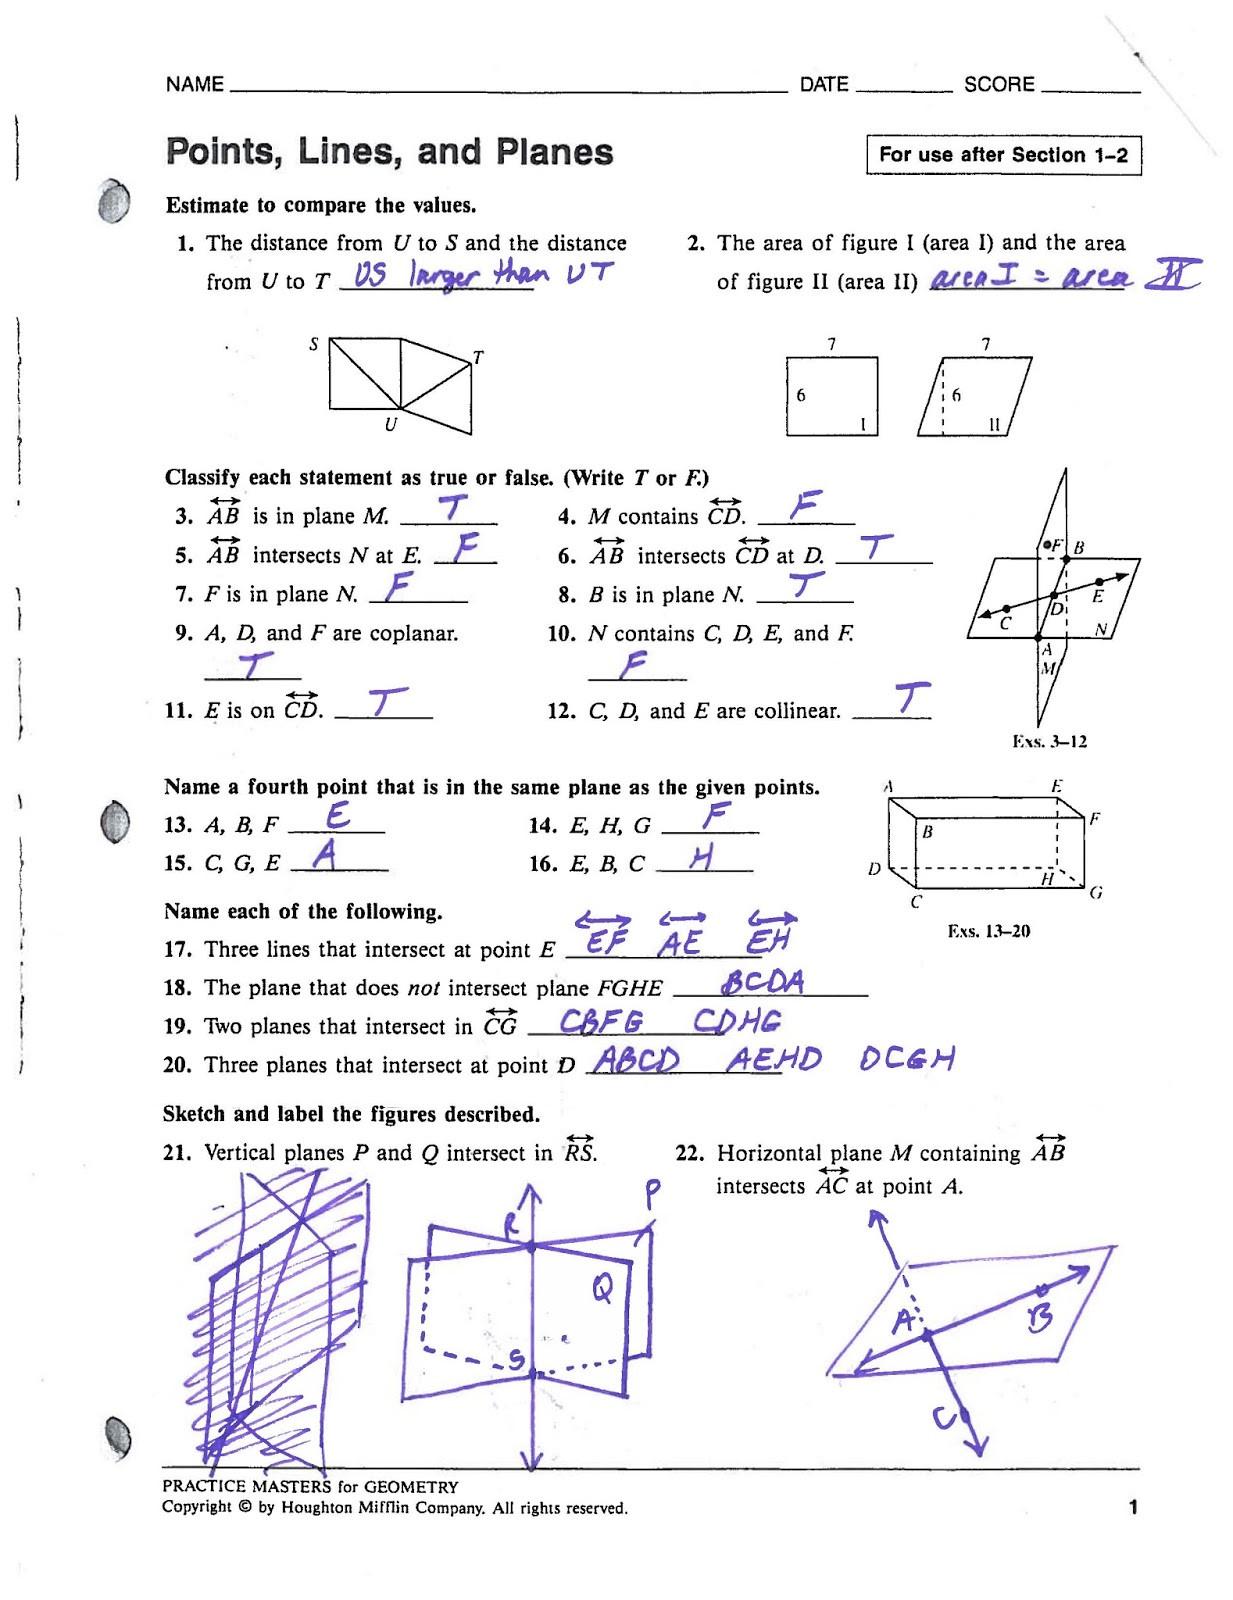 Angle Addition Postulate Worksheet Segment Addition Postulate Practice Answers